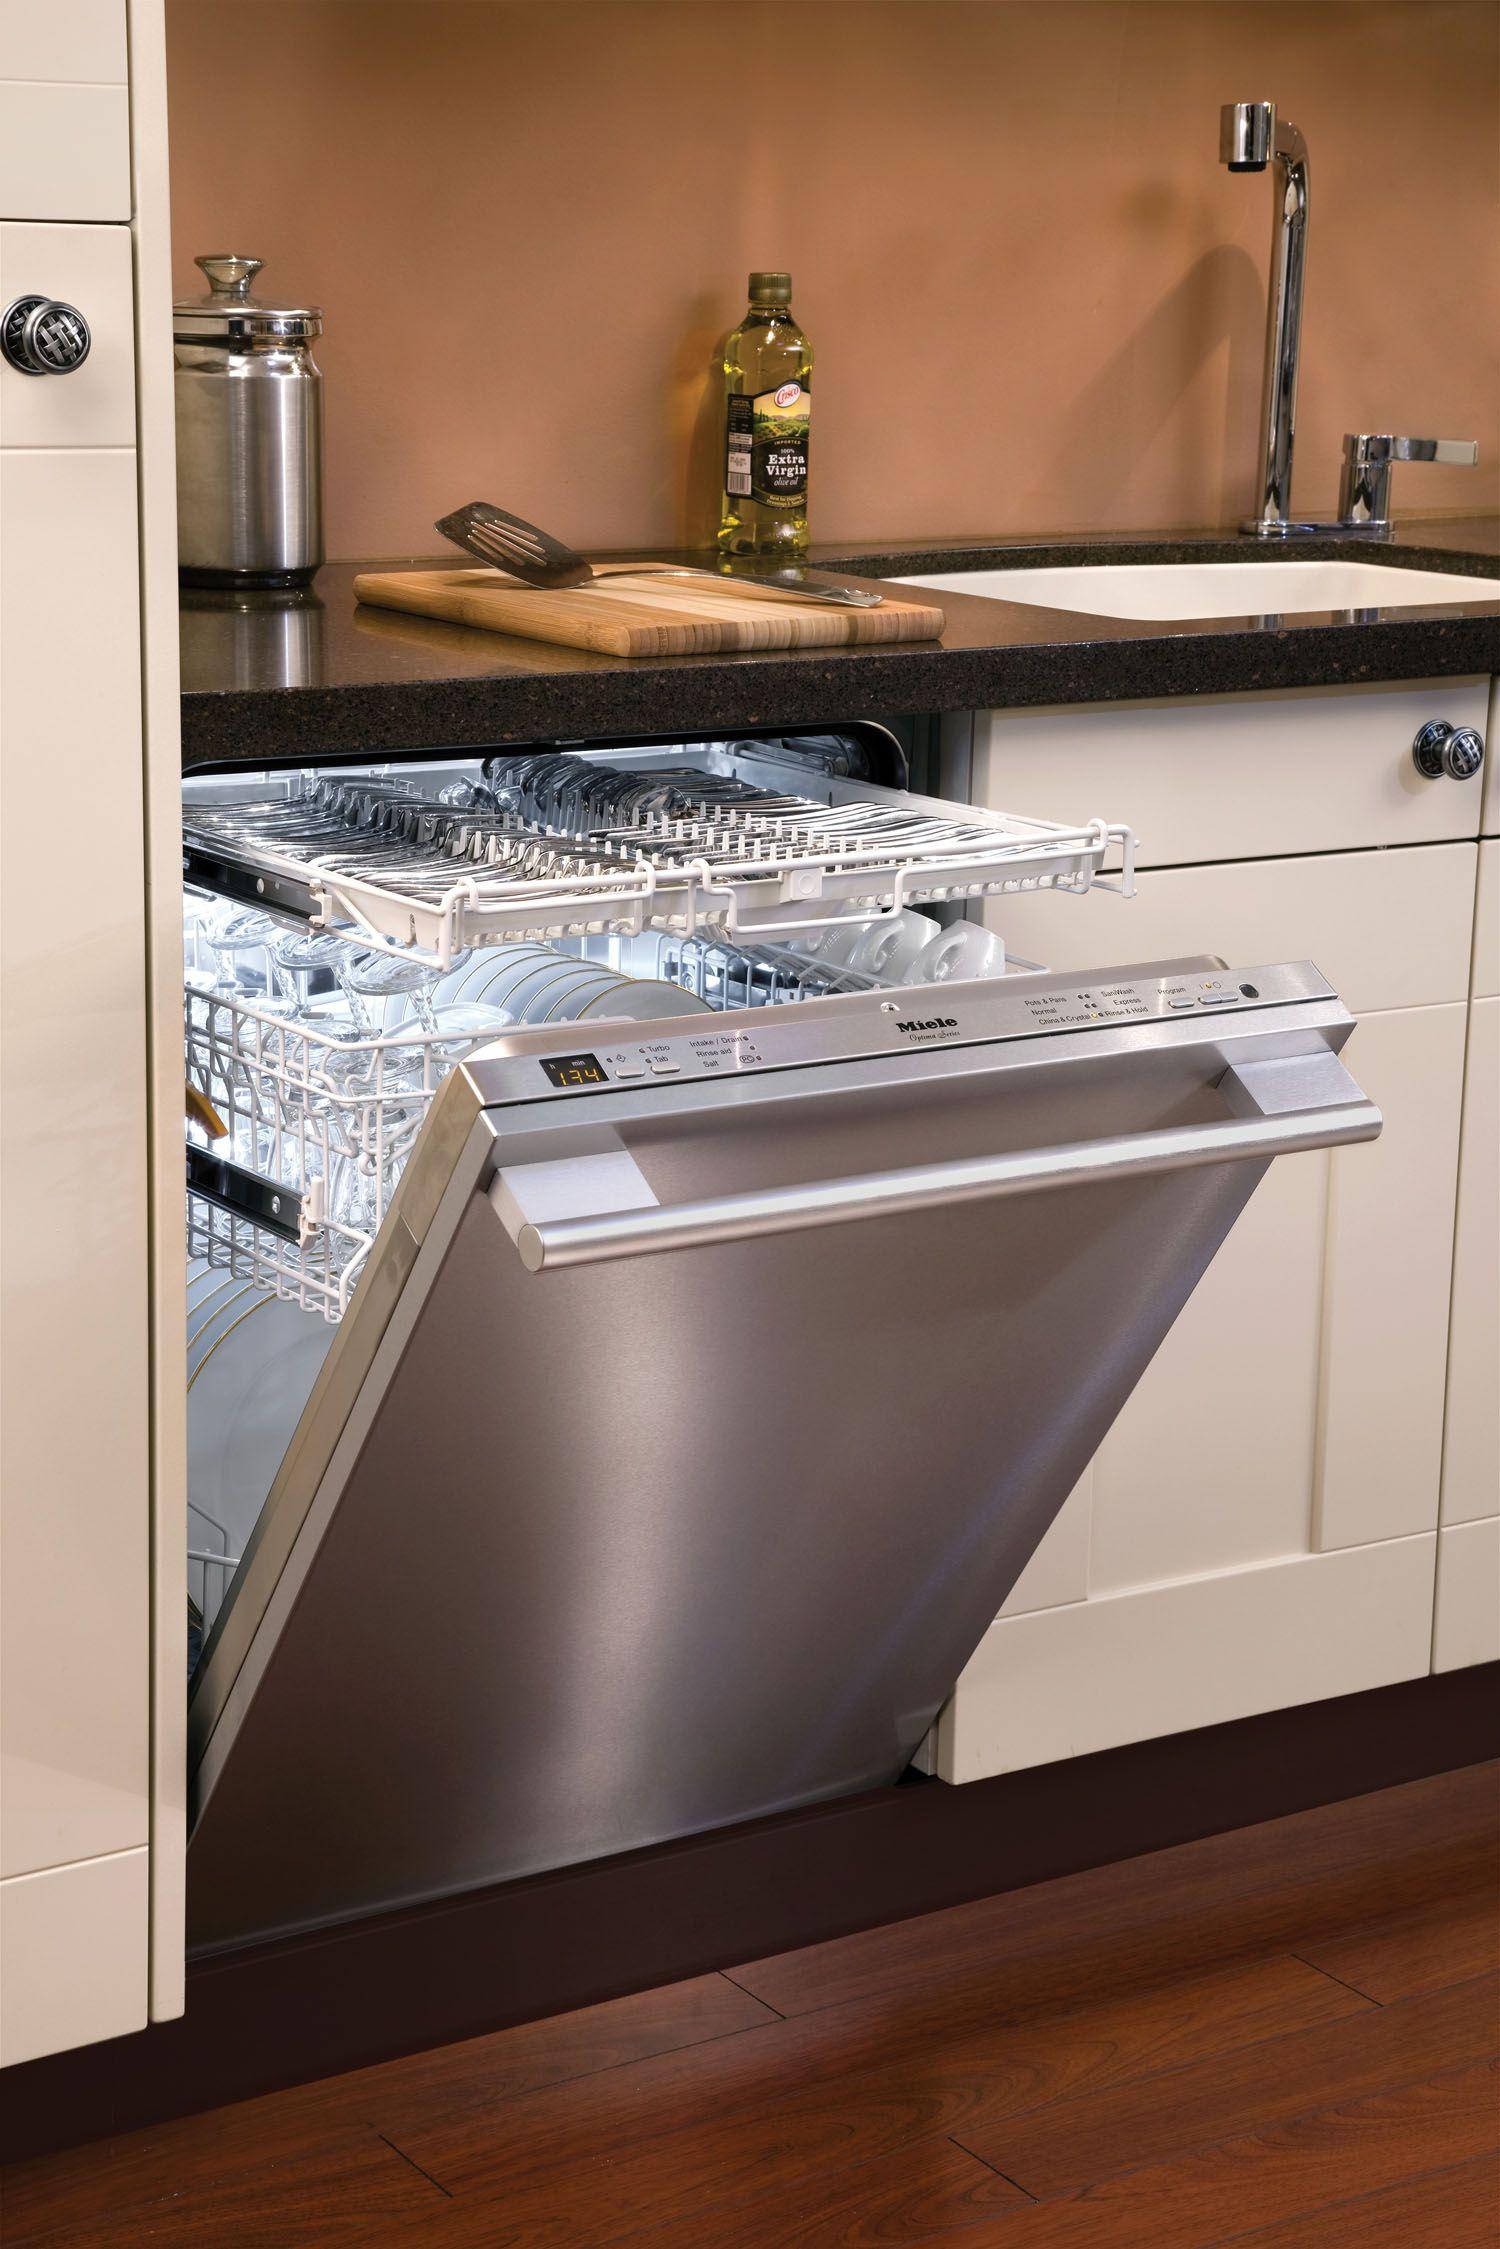 Top 5 Dishwashers For 2017 In Depth Appliance Comparison With Images Kitchen Design Program Miele Dishwasher Kitchen Design